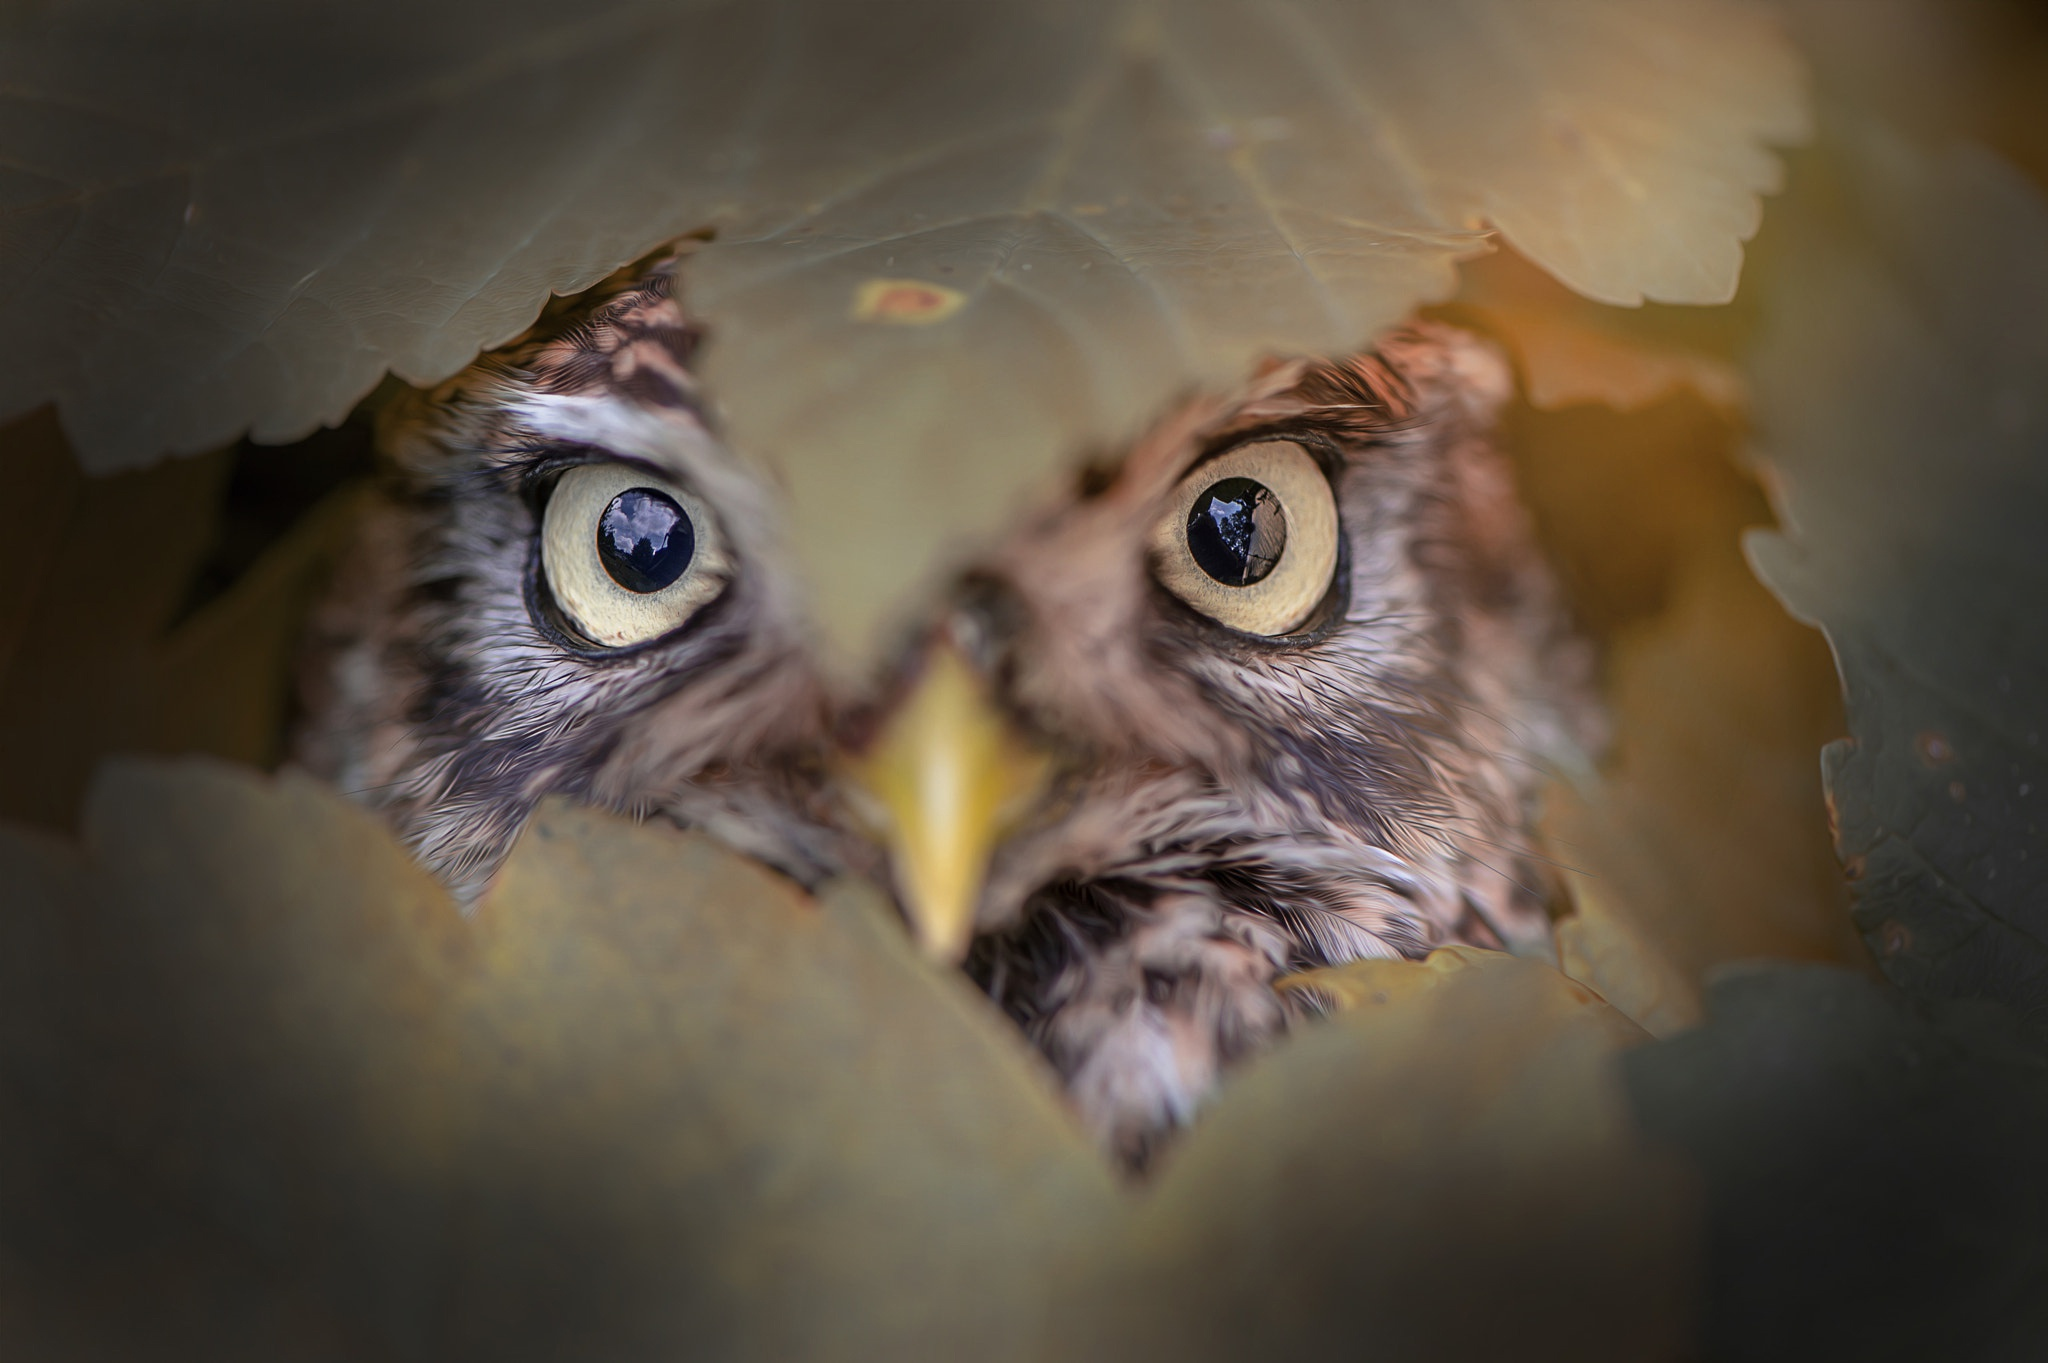 бытового взгляд на птиц глазами фотографа начала хотя про